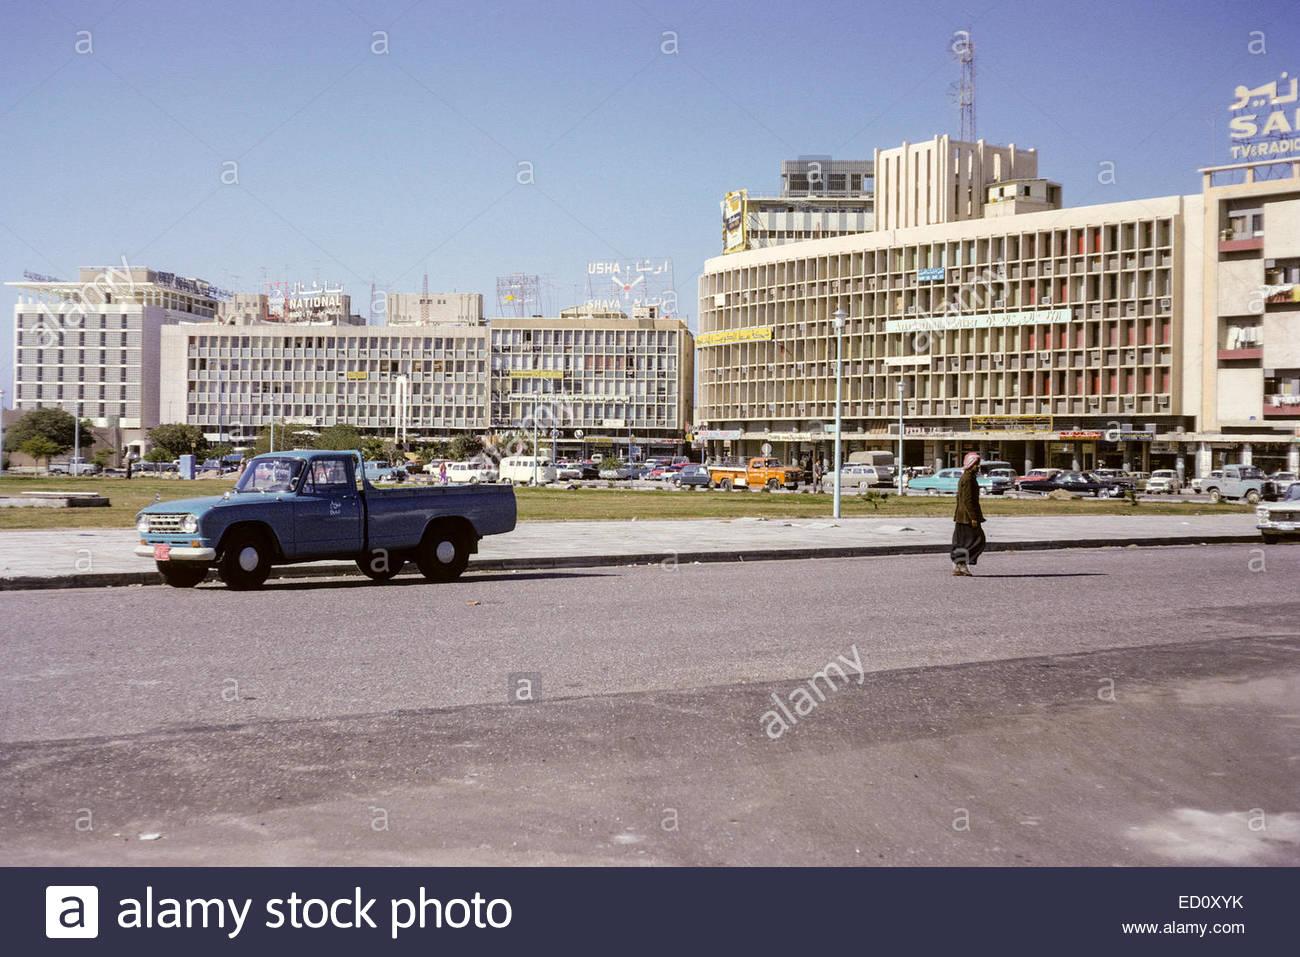 Kuwait April 1967 Downtown Kuwait Sheraton Hotel on Far Left 1300x957